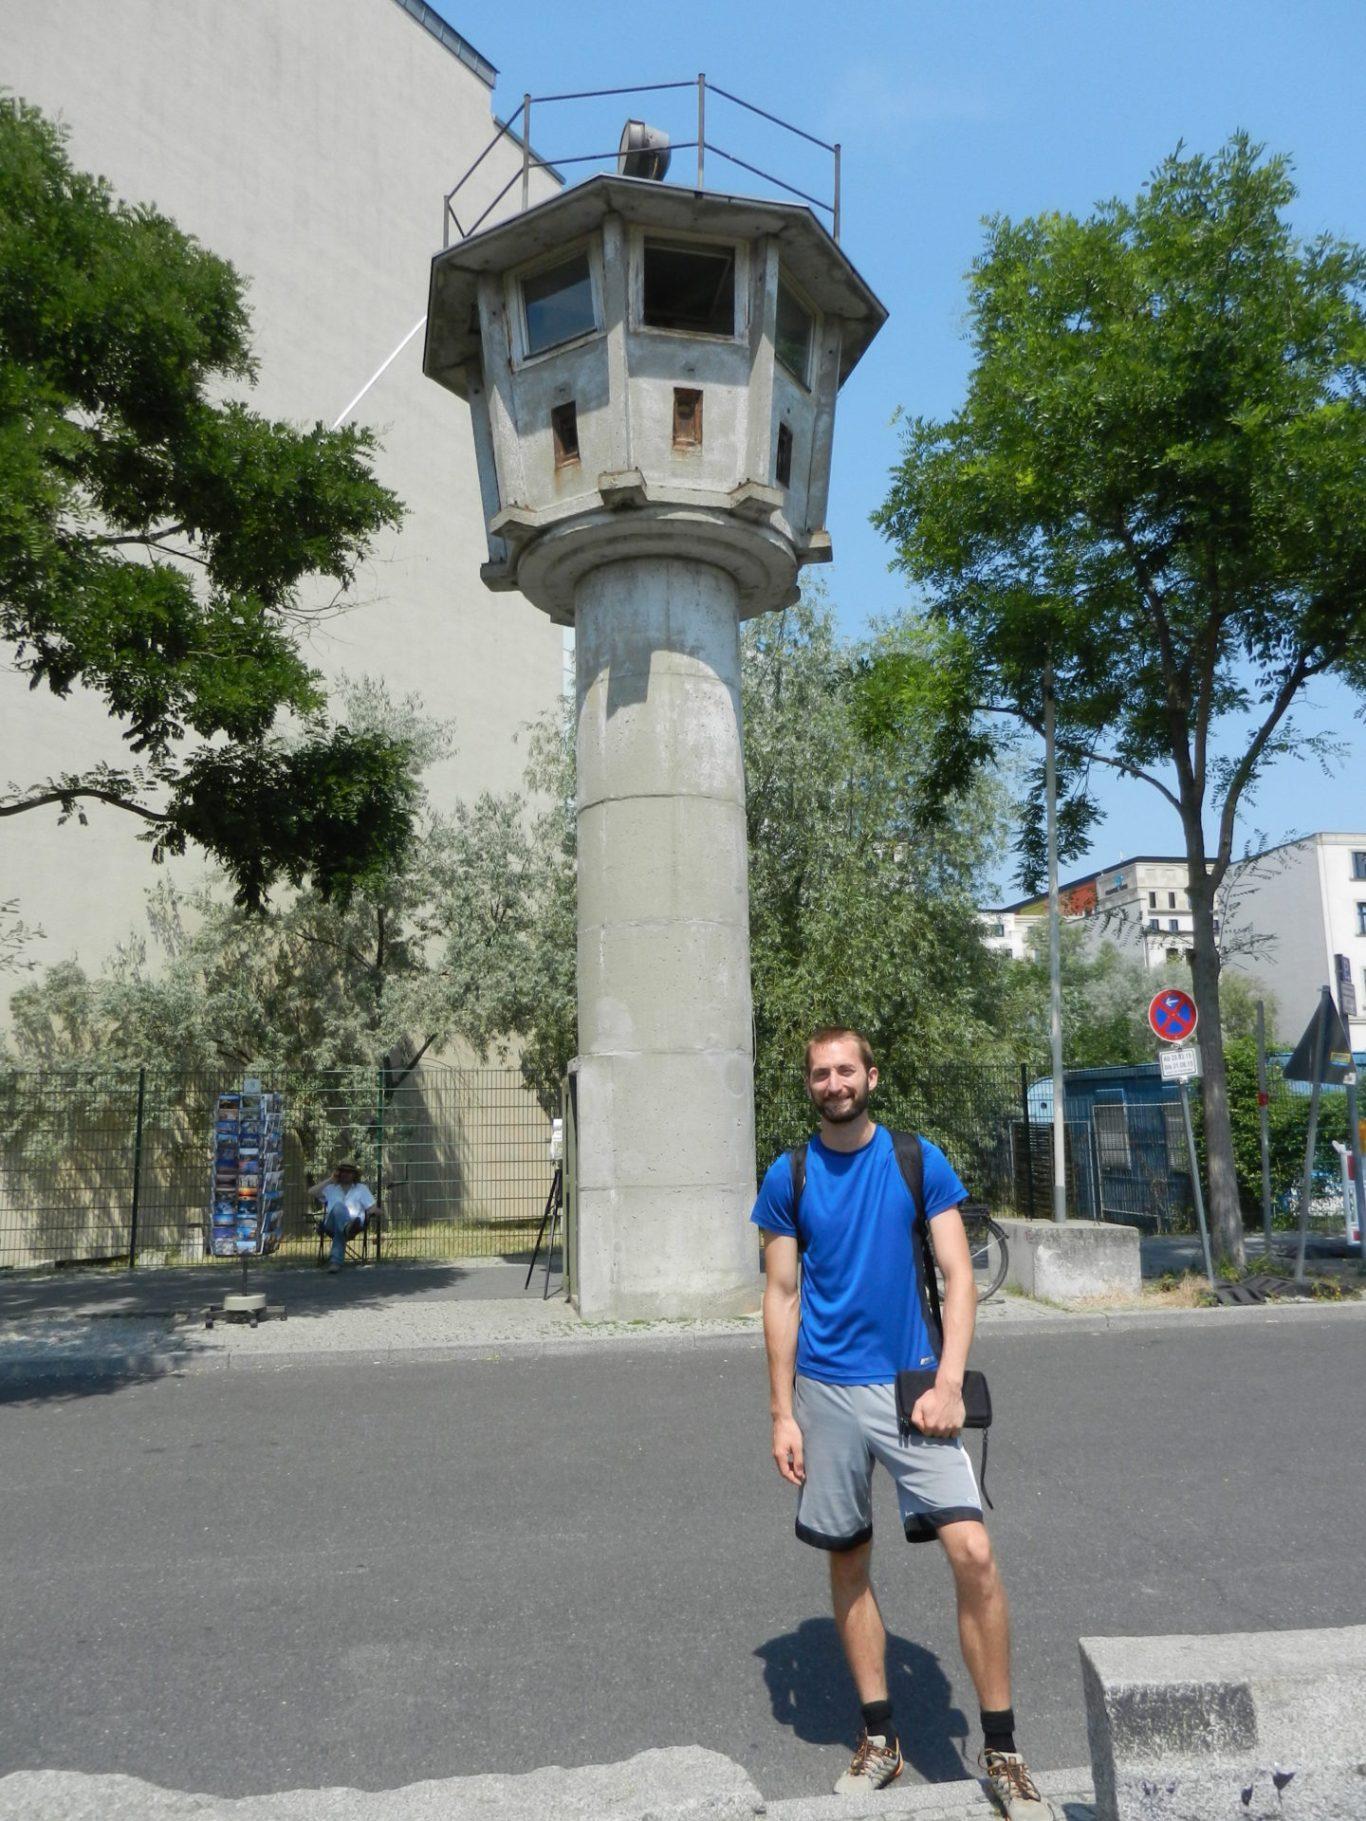 Potsdamer Platz BT 6 Watchtower in Berlin, Germany